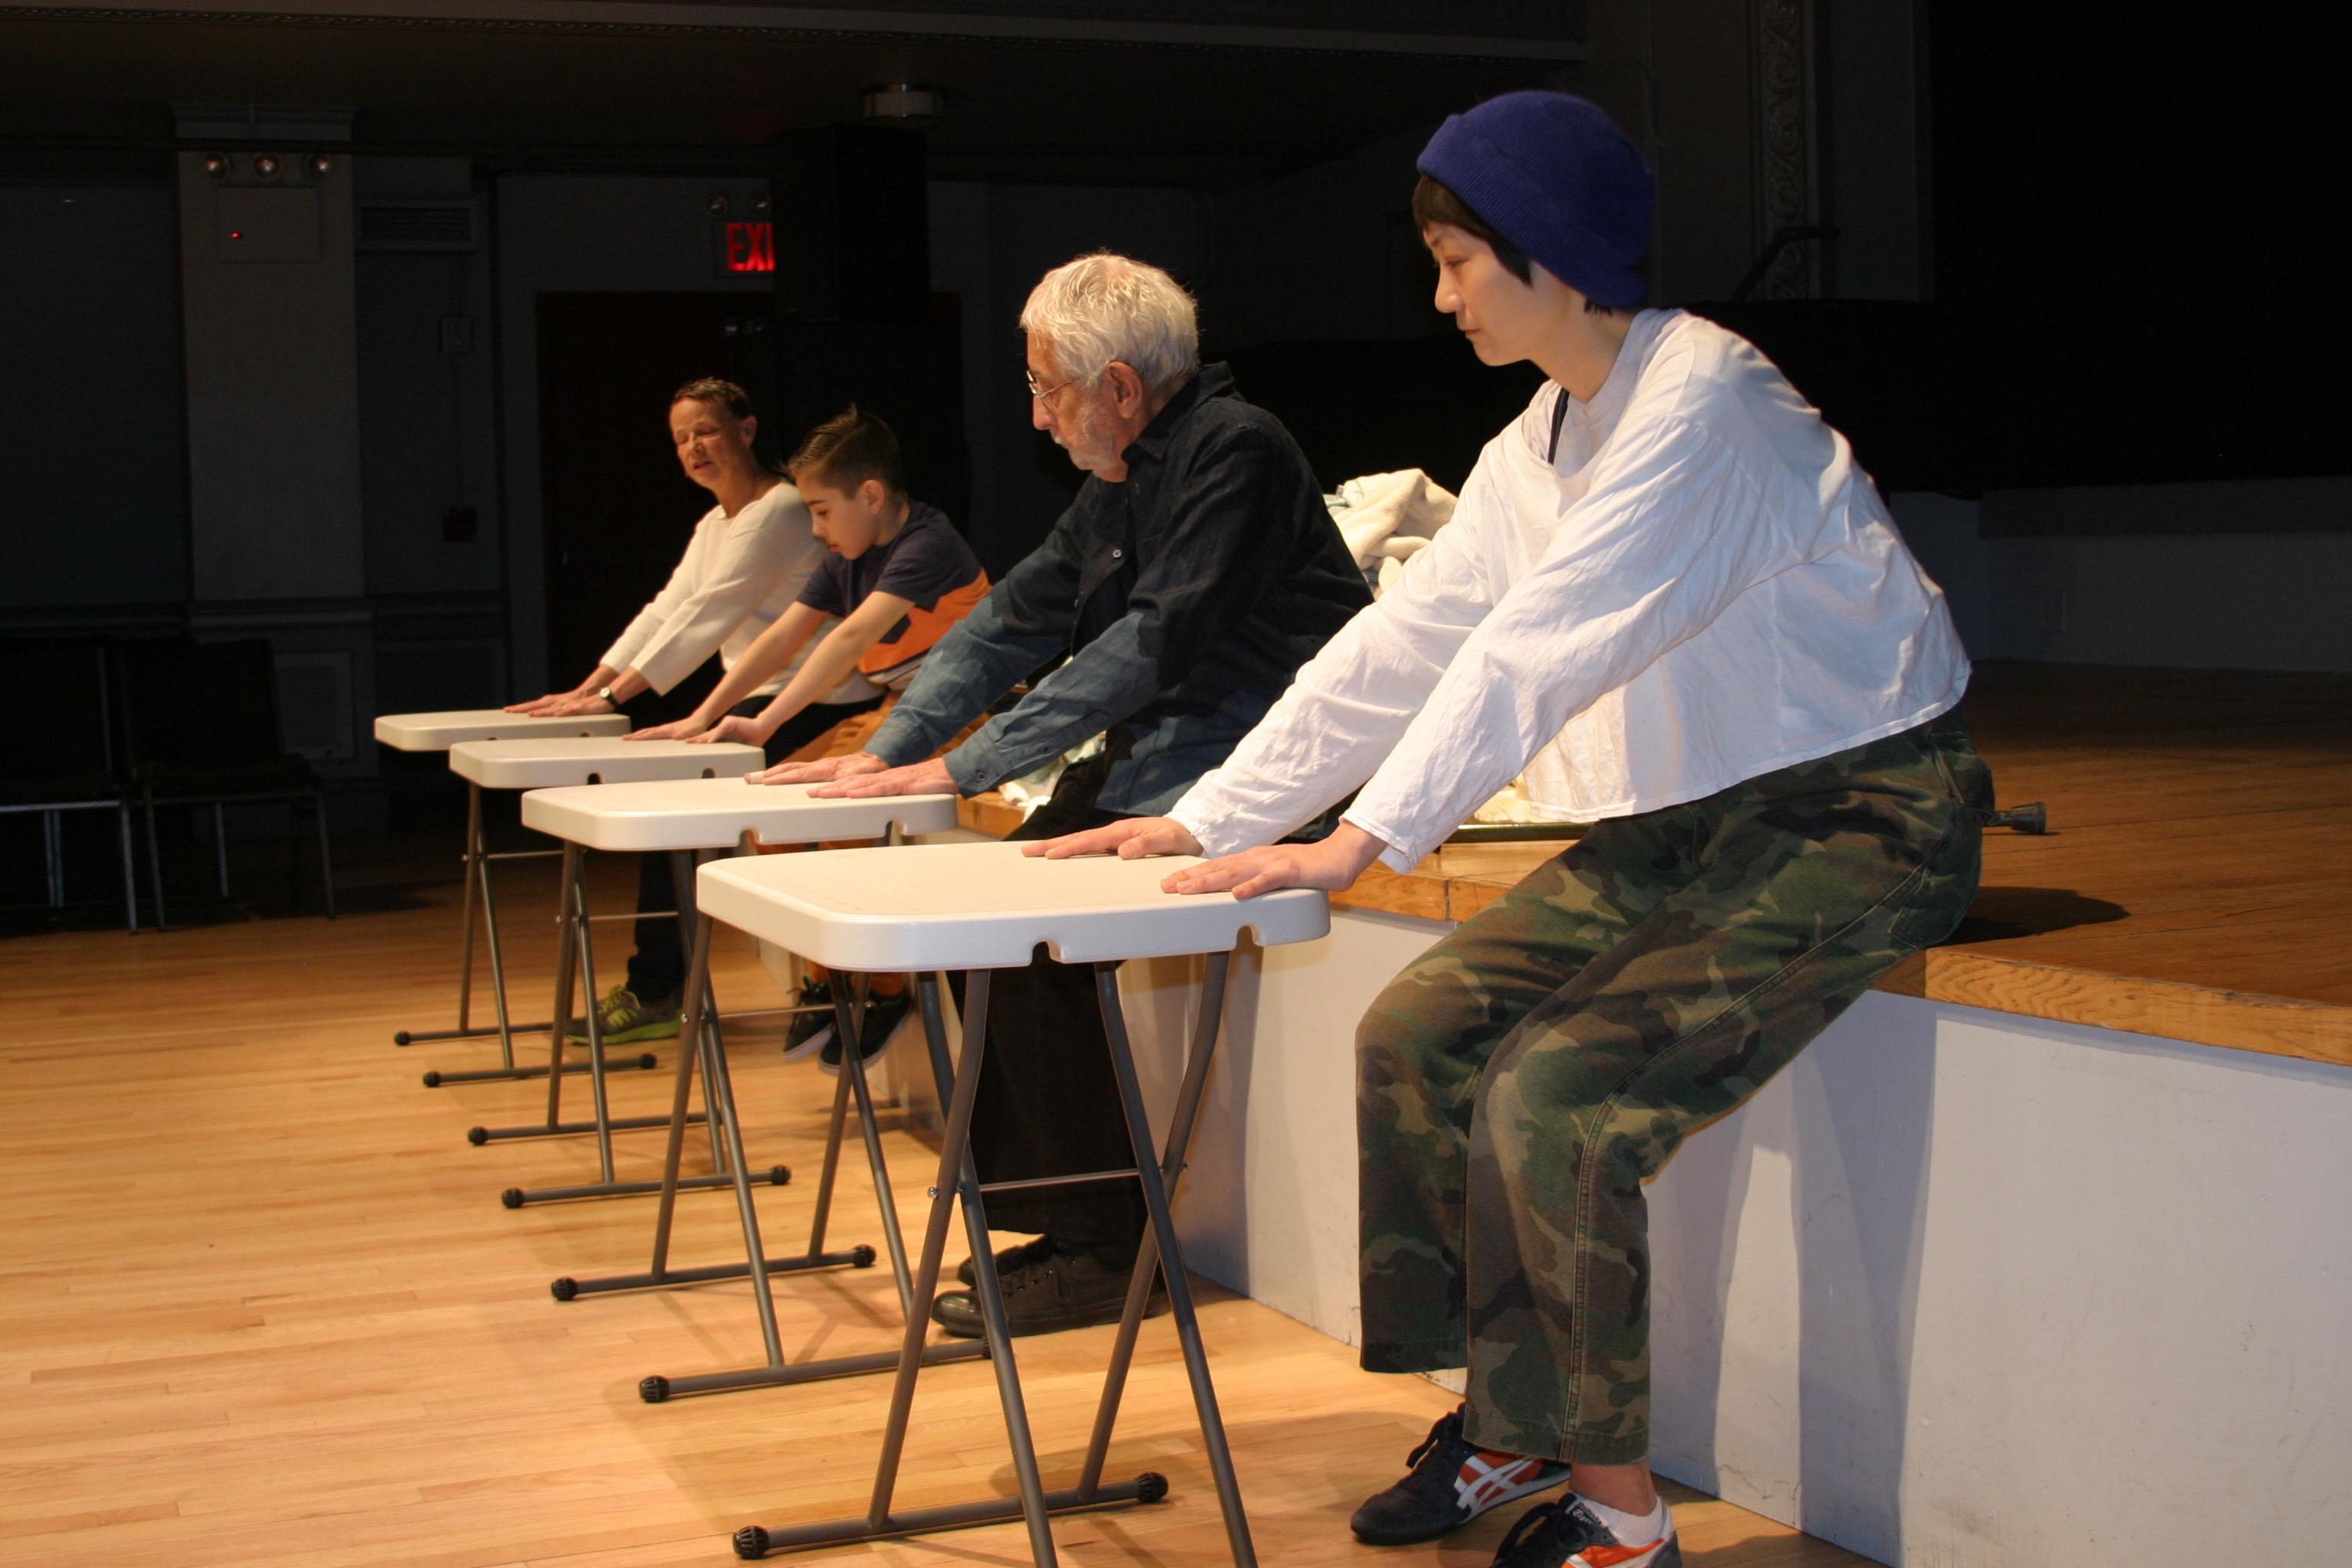 chair dance ritual song dual walker transport maura donohue culturebot la mama moves at 13